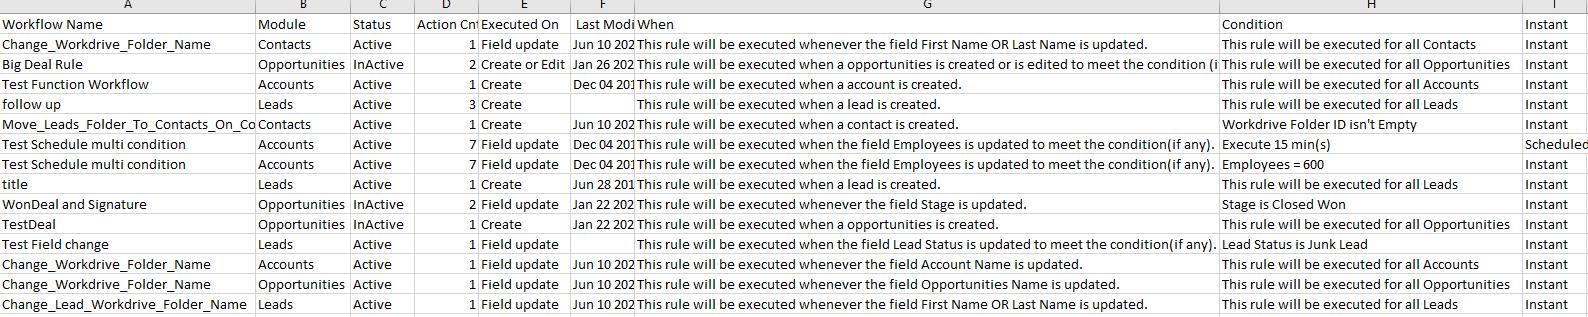 WorkflowSpreadSheetDemoData 2020-07